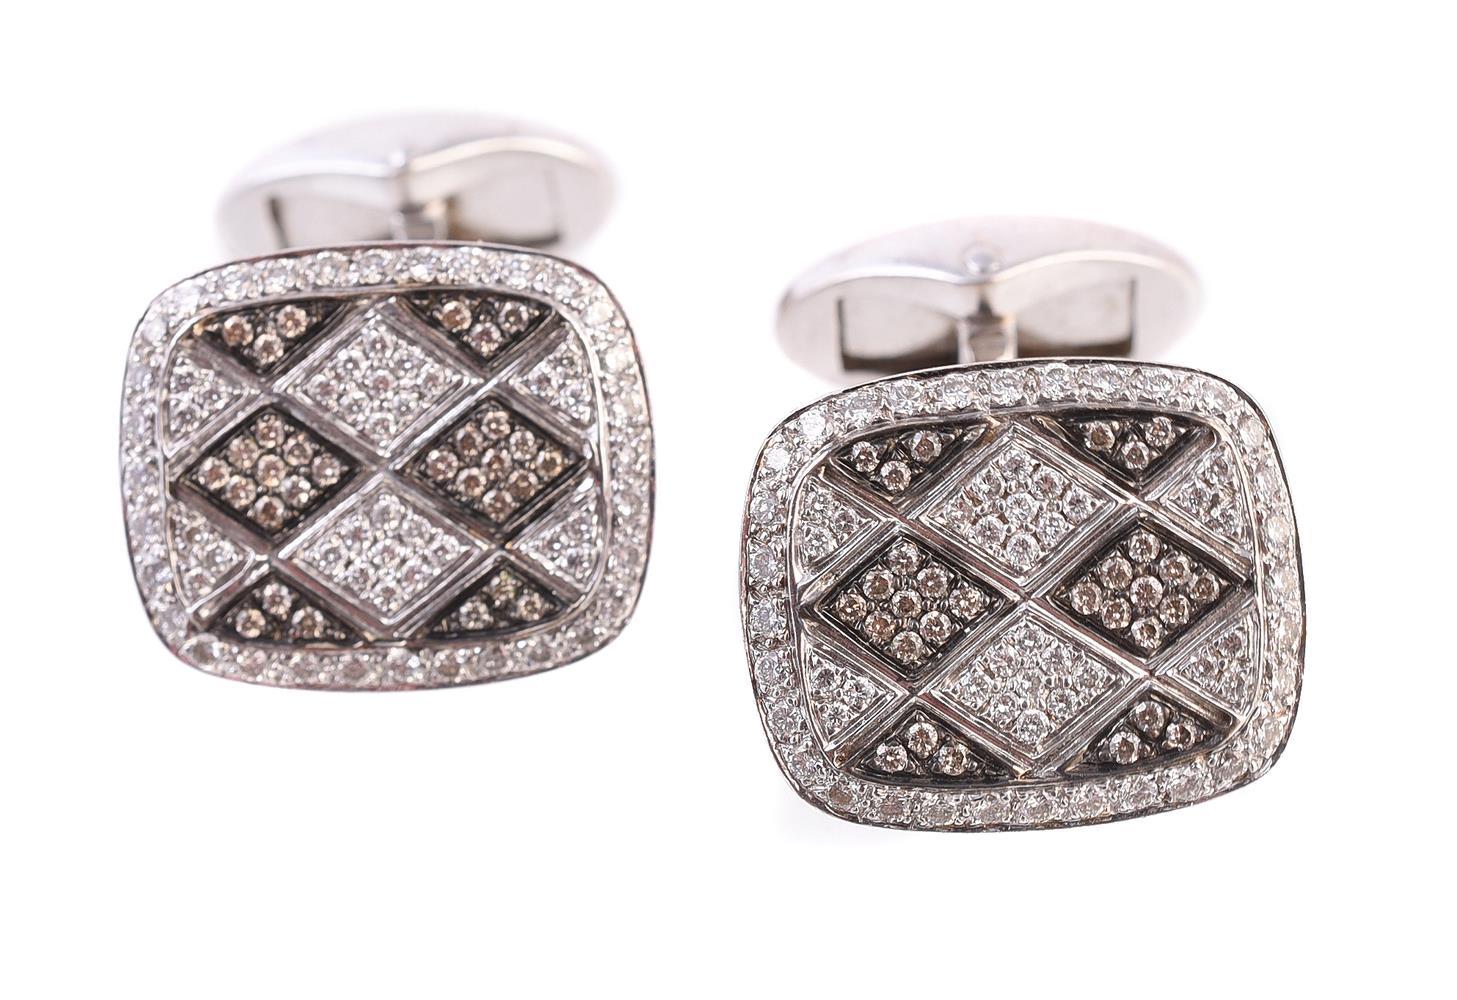 A pair of diamond cufflinks by Mouawad